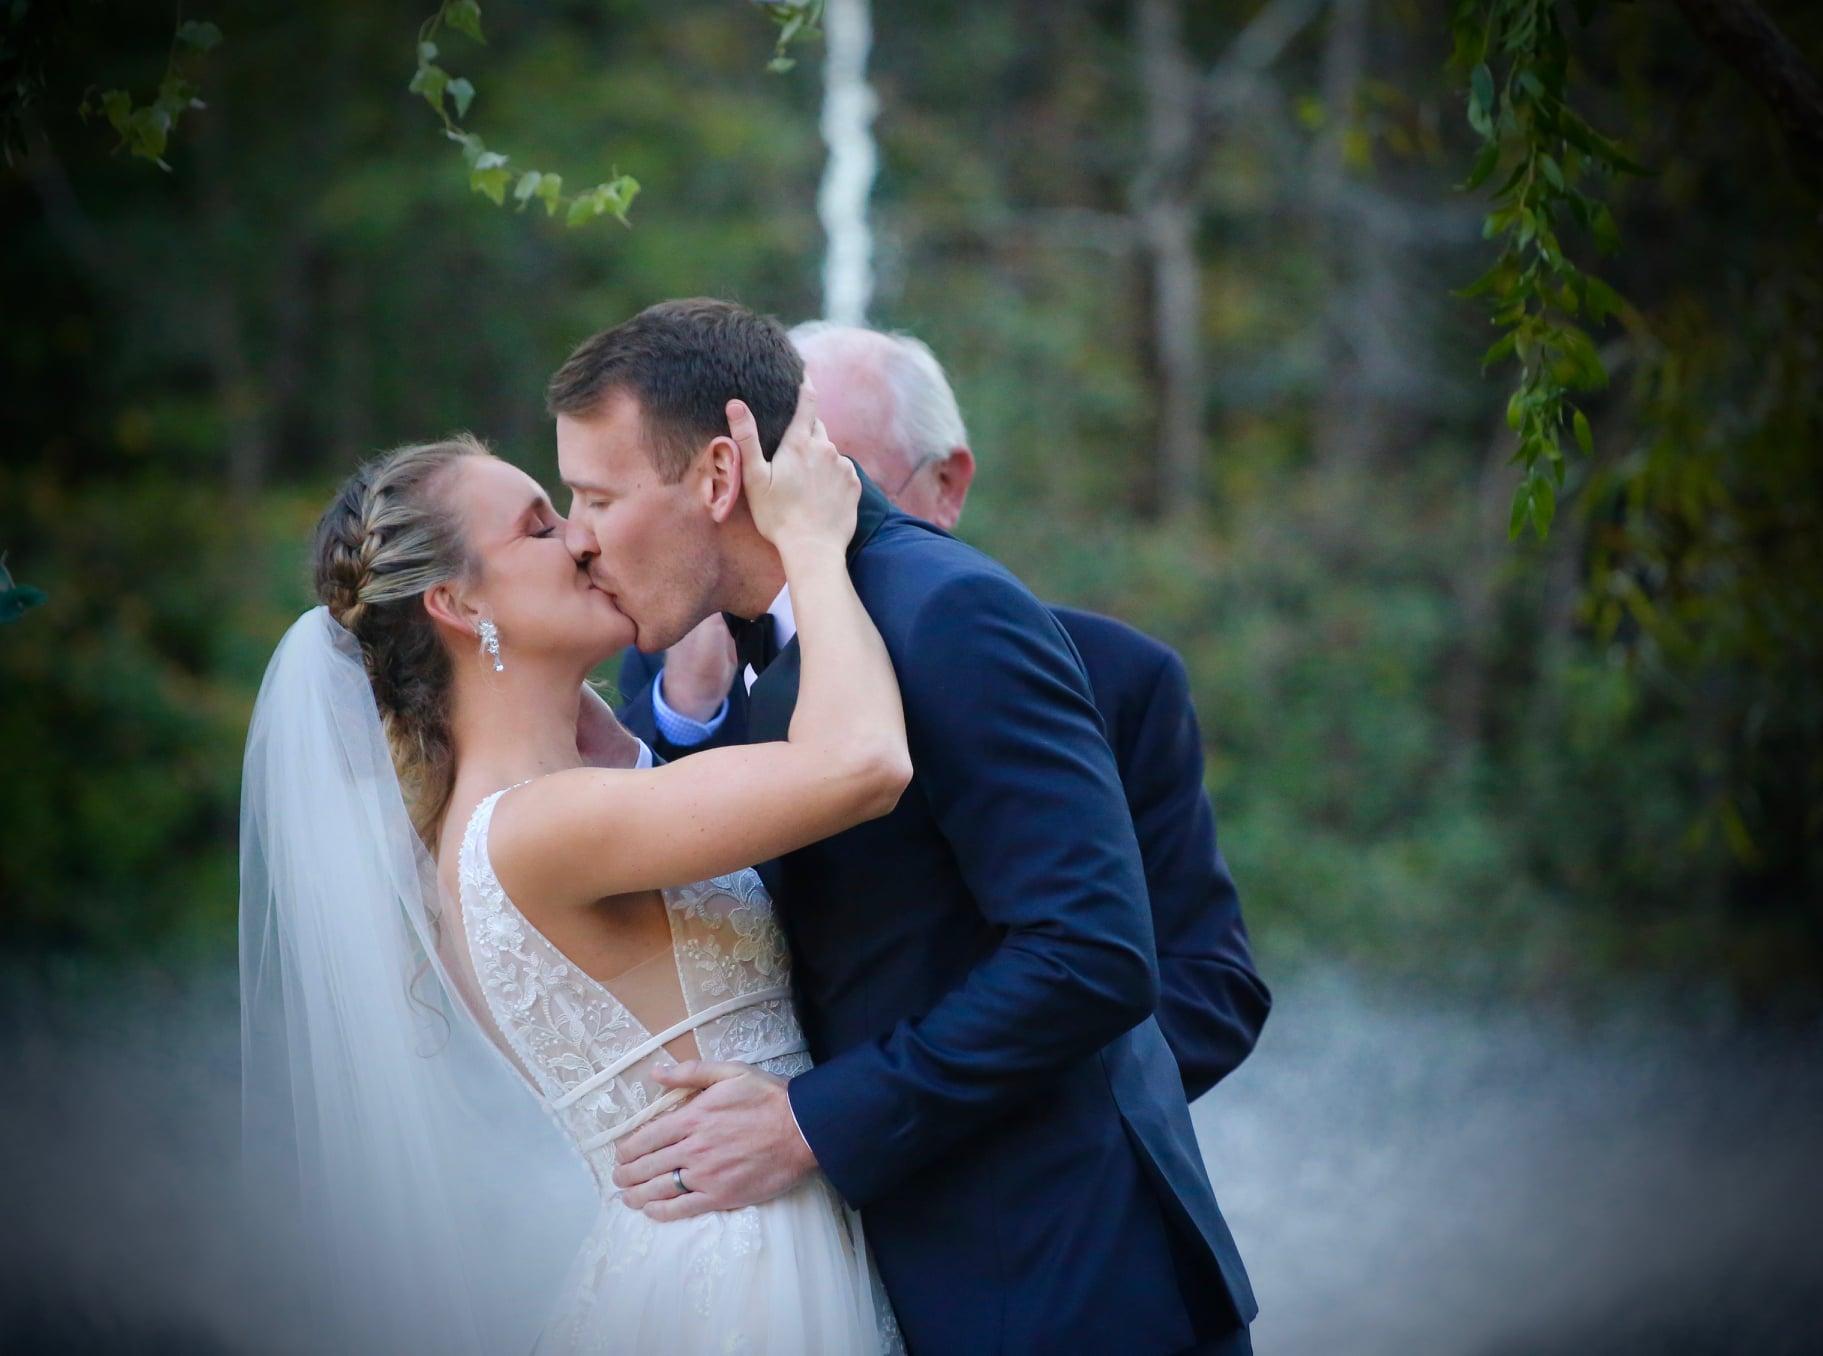 Waterfall first kiss wedding veil and bridal hair